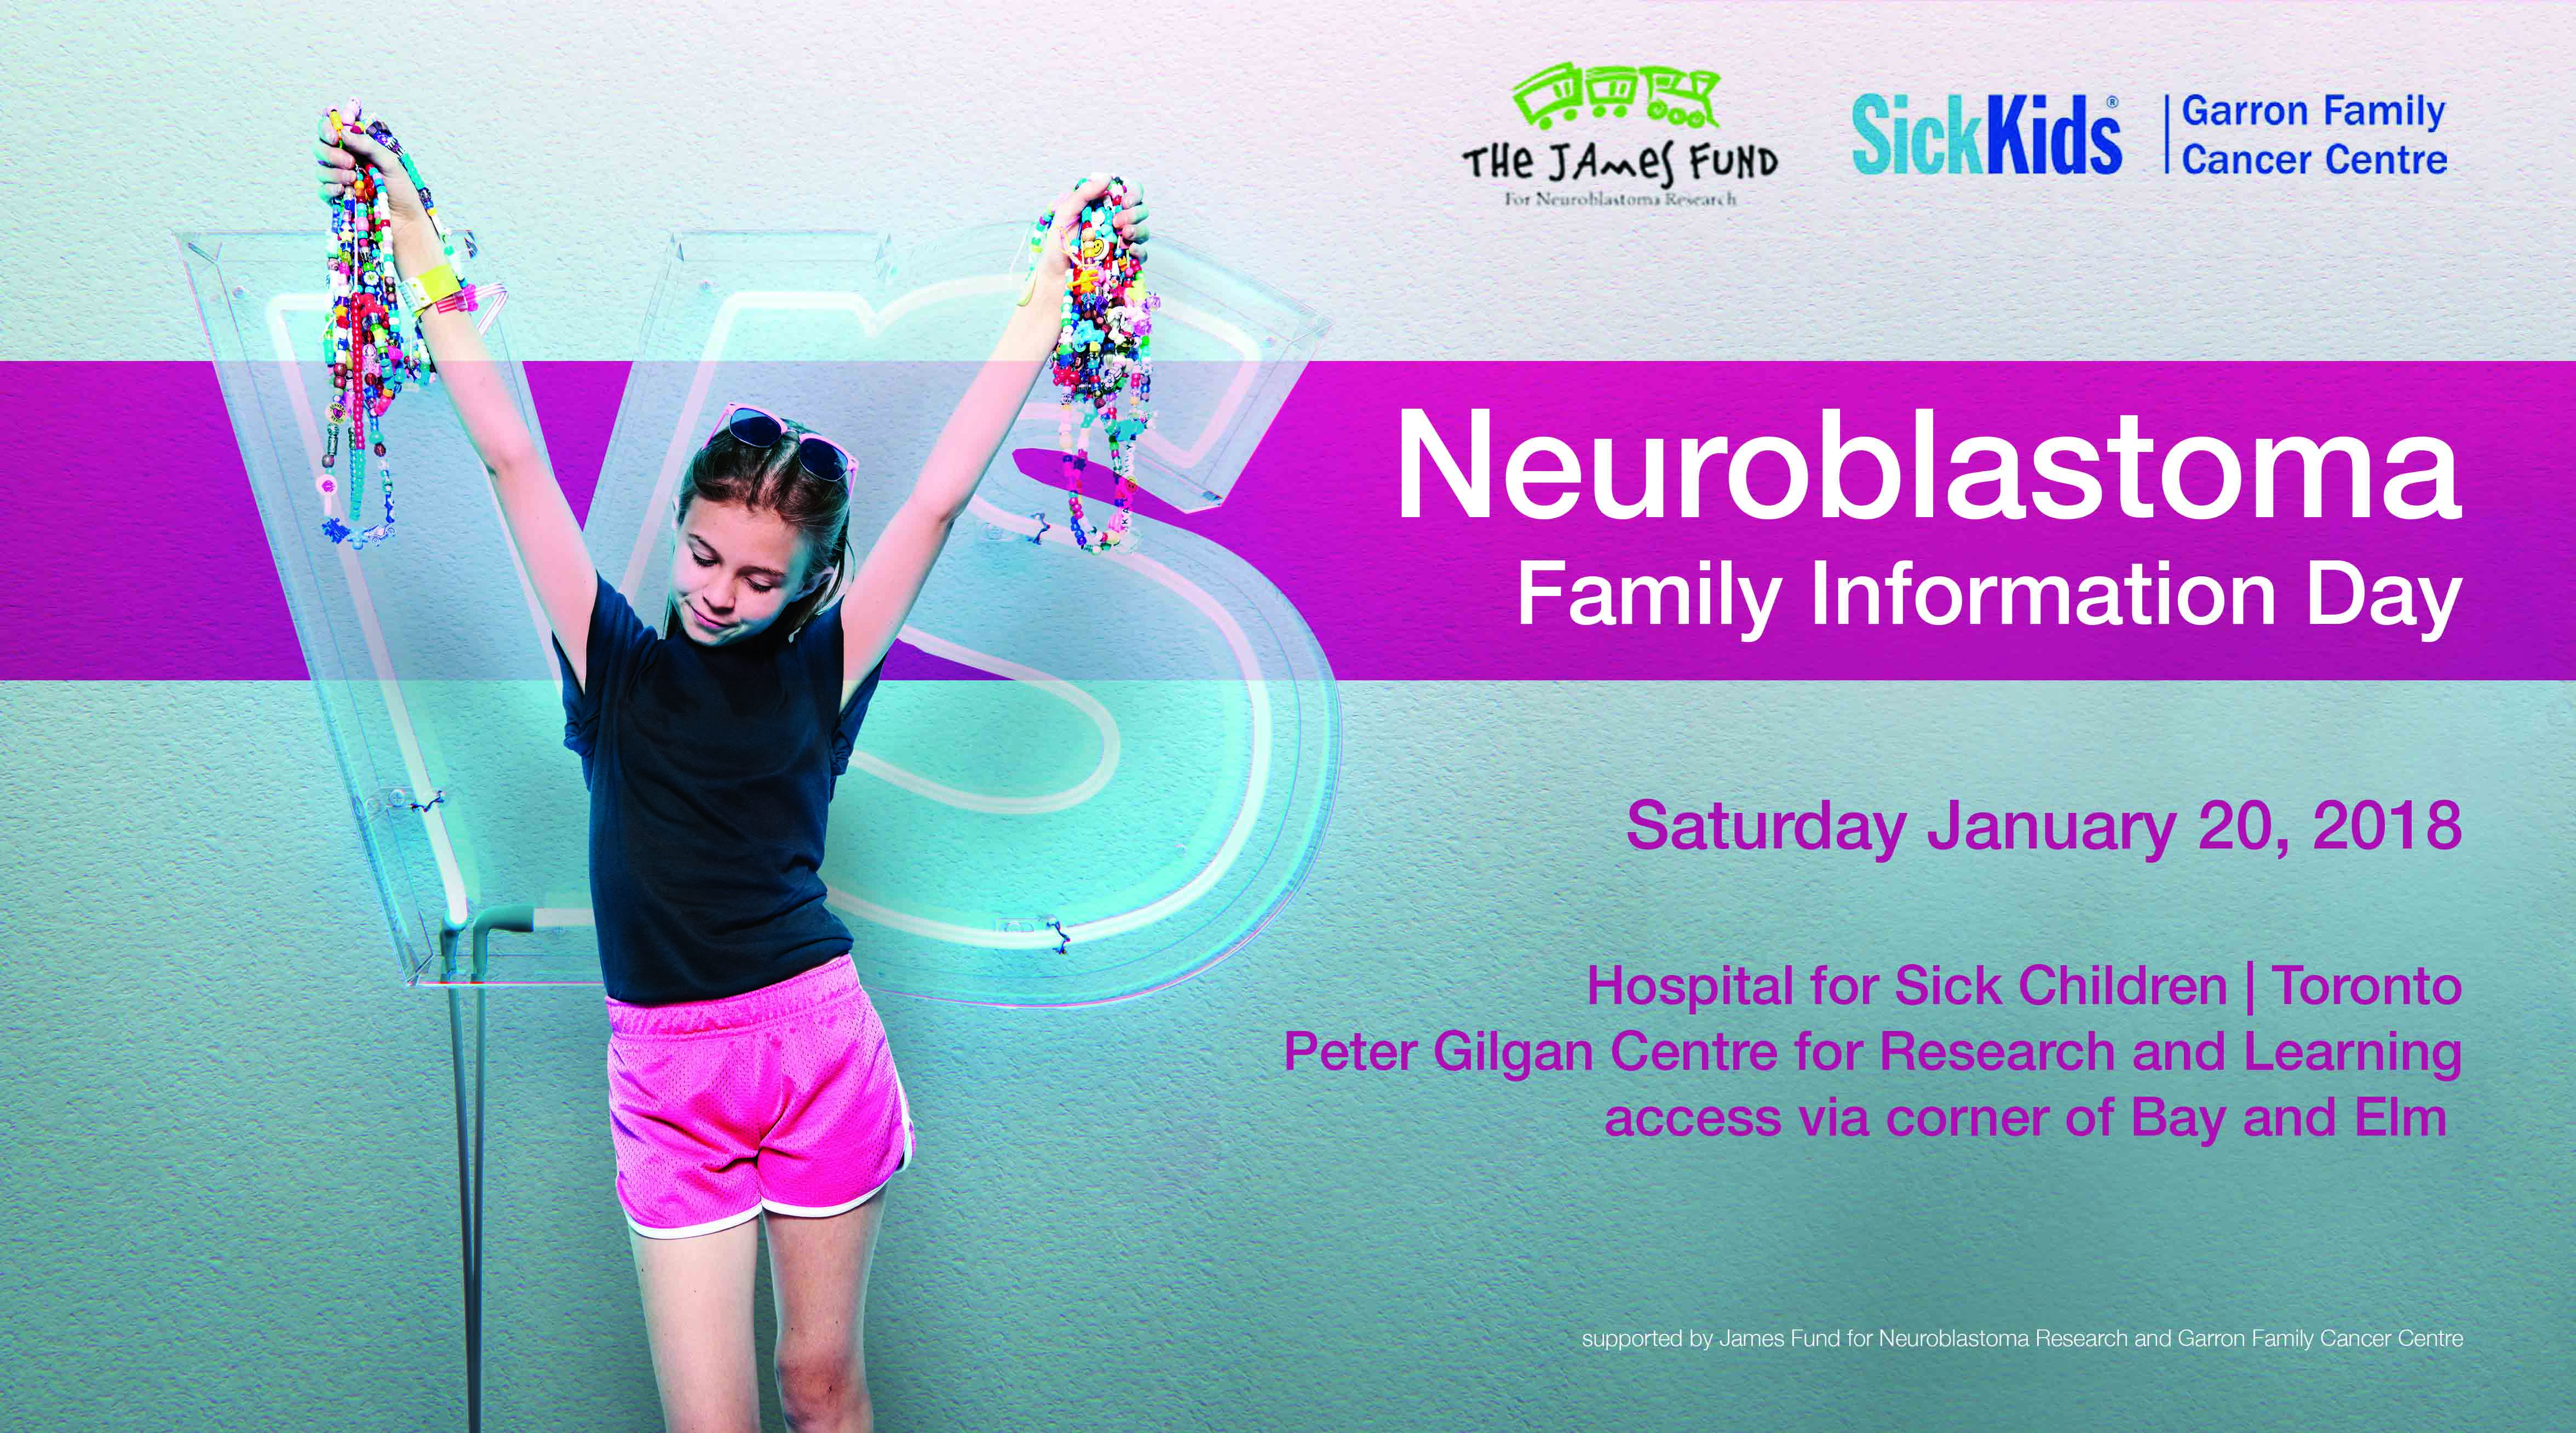 Neuroblastoma Family Information Day